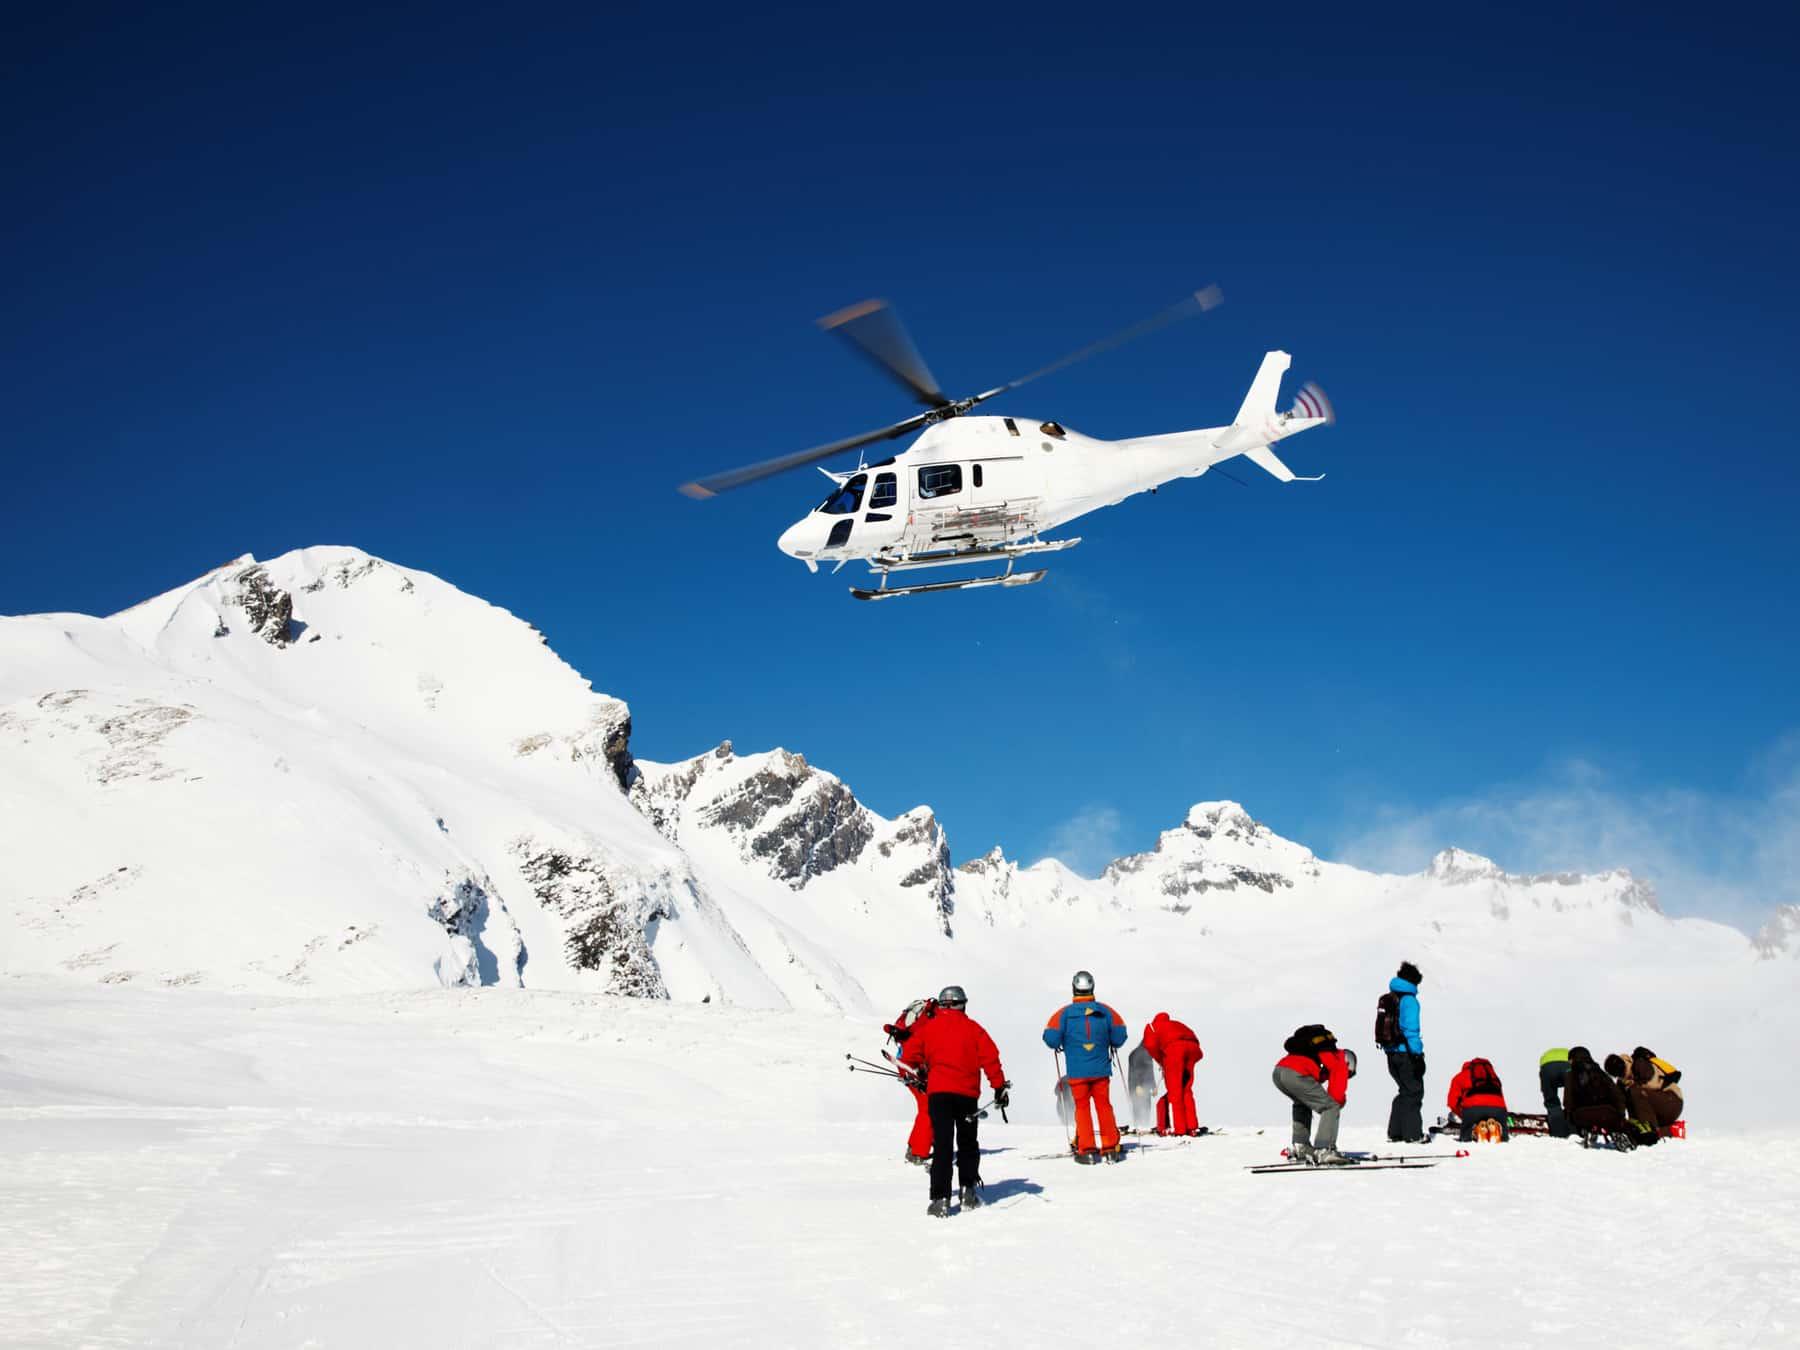 Heli Skiing Helicopter, Mont Blanc ski resort, France, Europe.